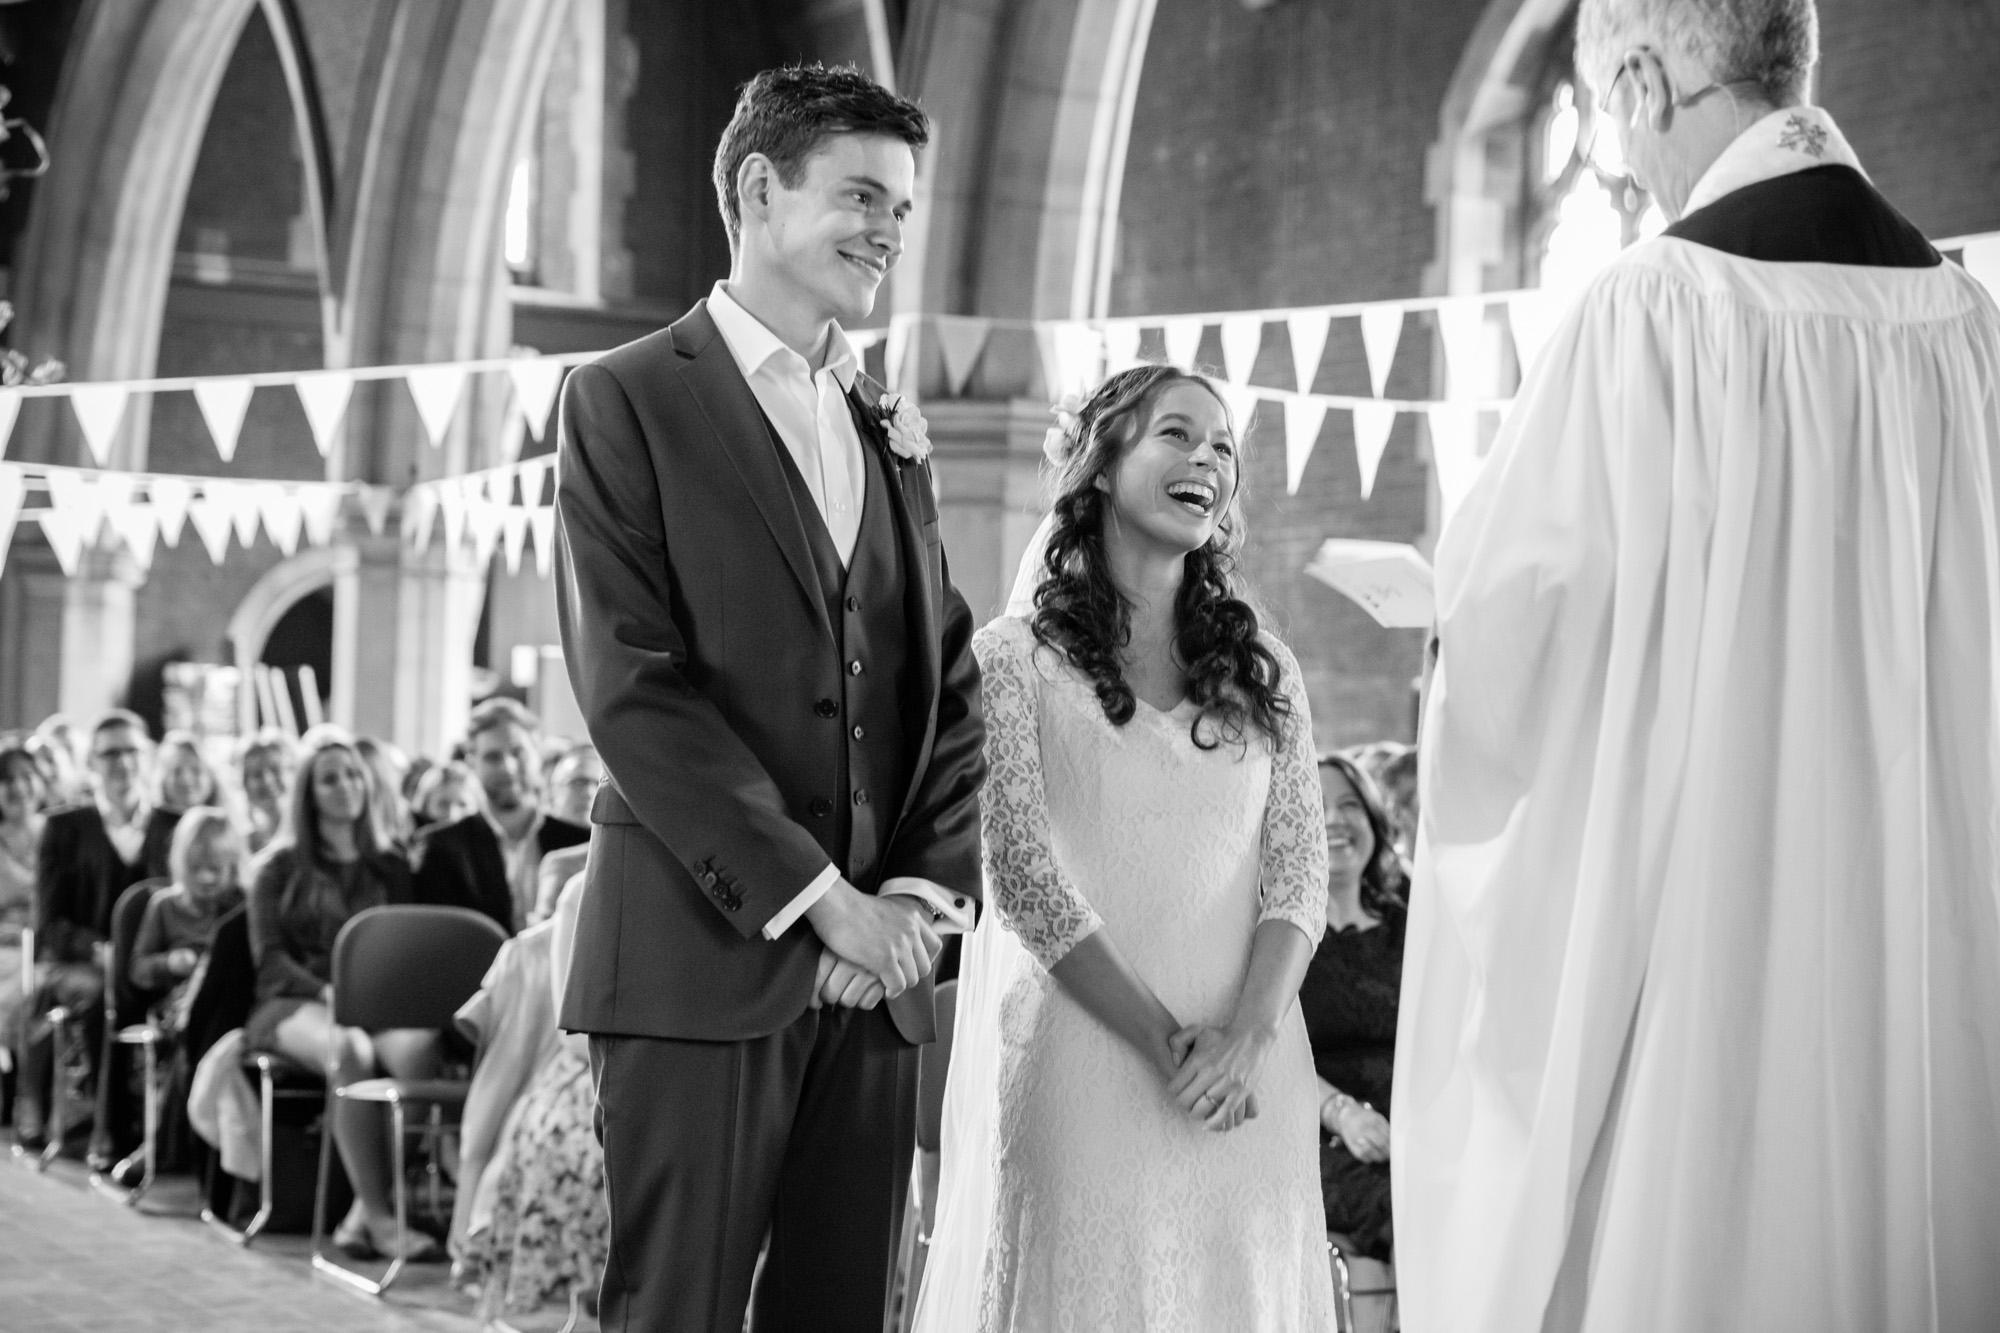 weddings-couples-love-photographer-oxford-london-jonathan-self-photography-29.jpg